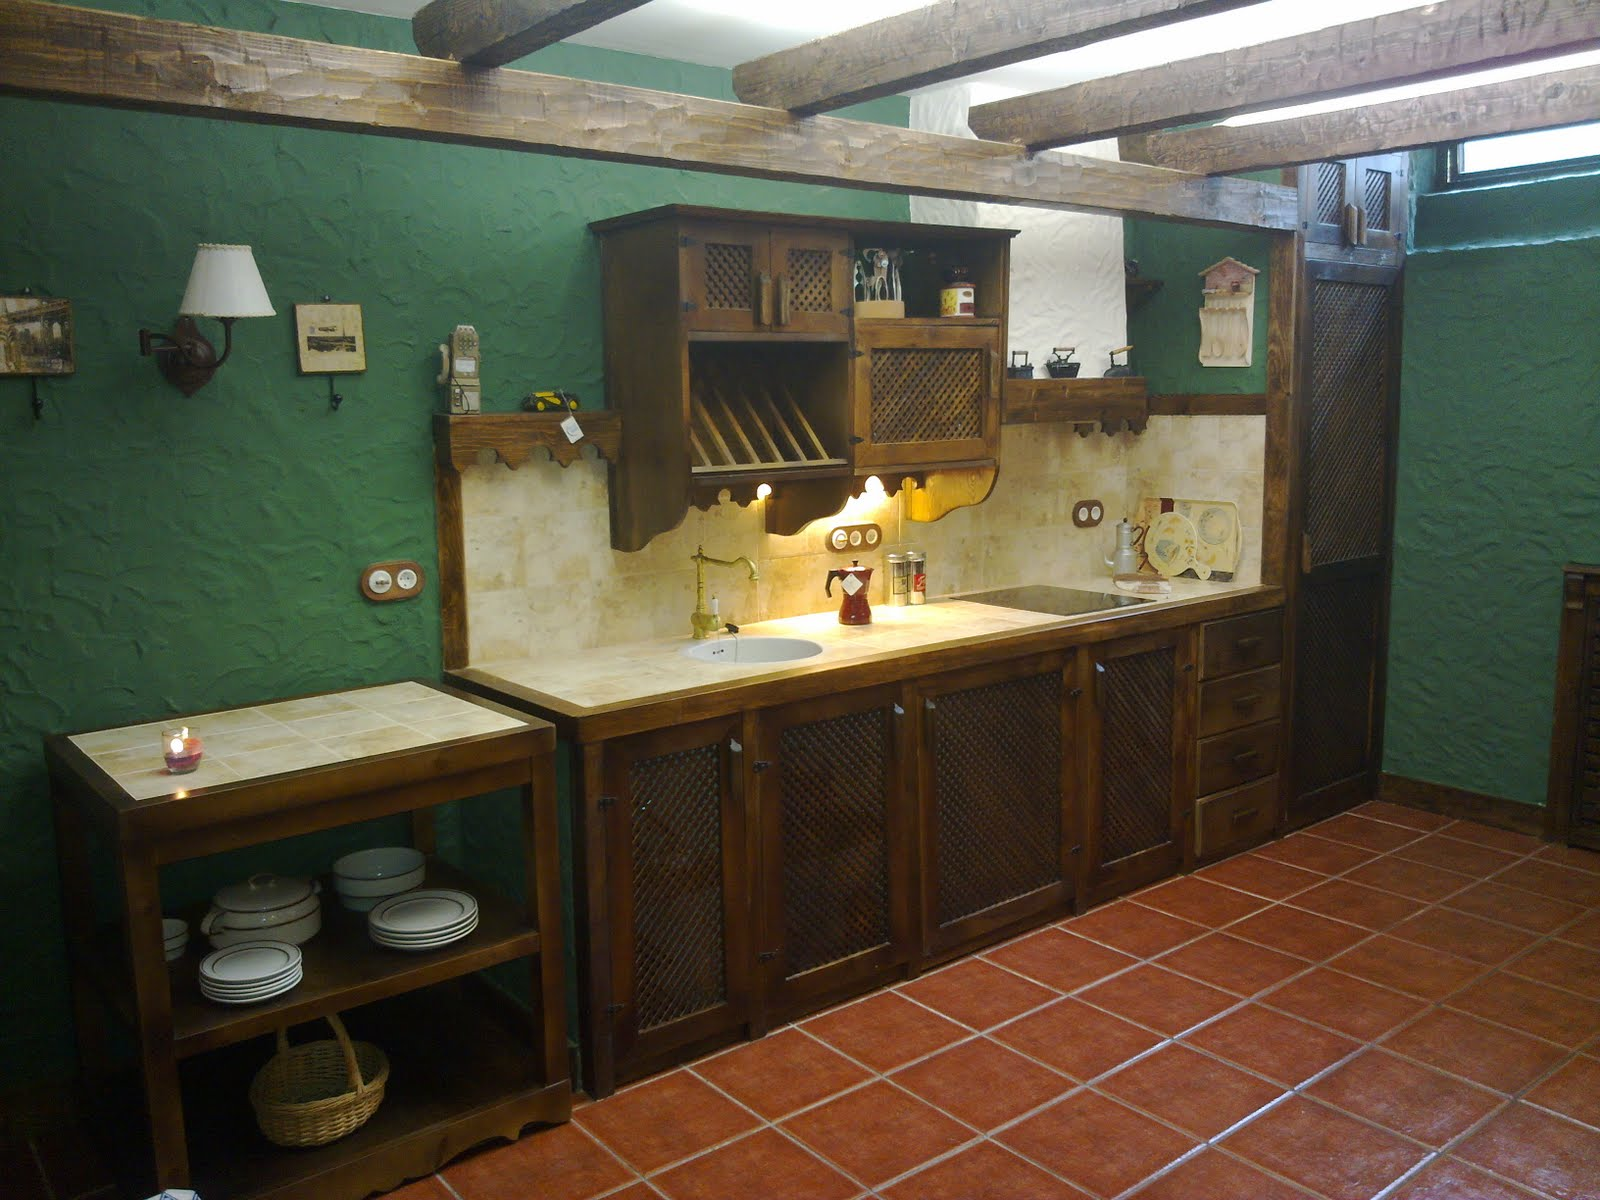 1000 images about pivnite beciuri on pinterest wine - Decorar bodega chalet ...